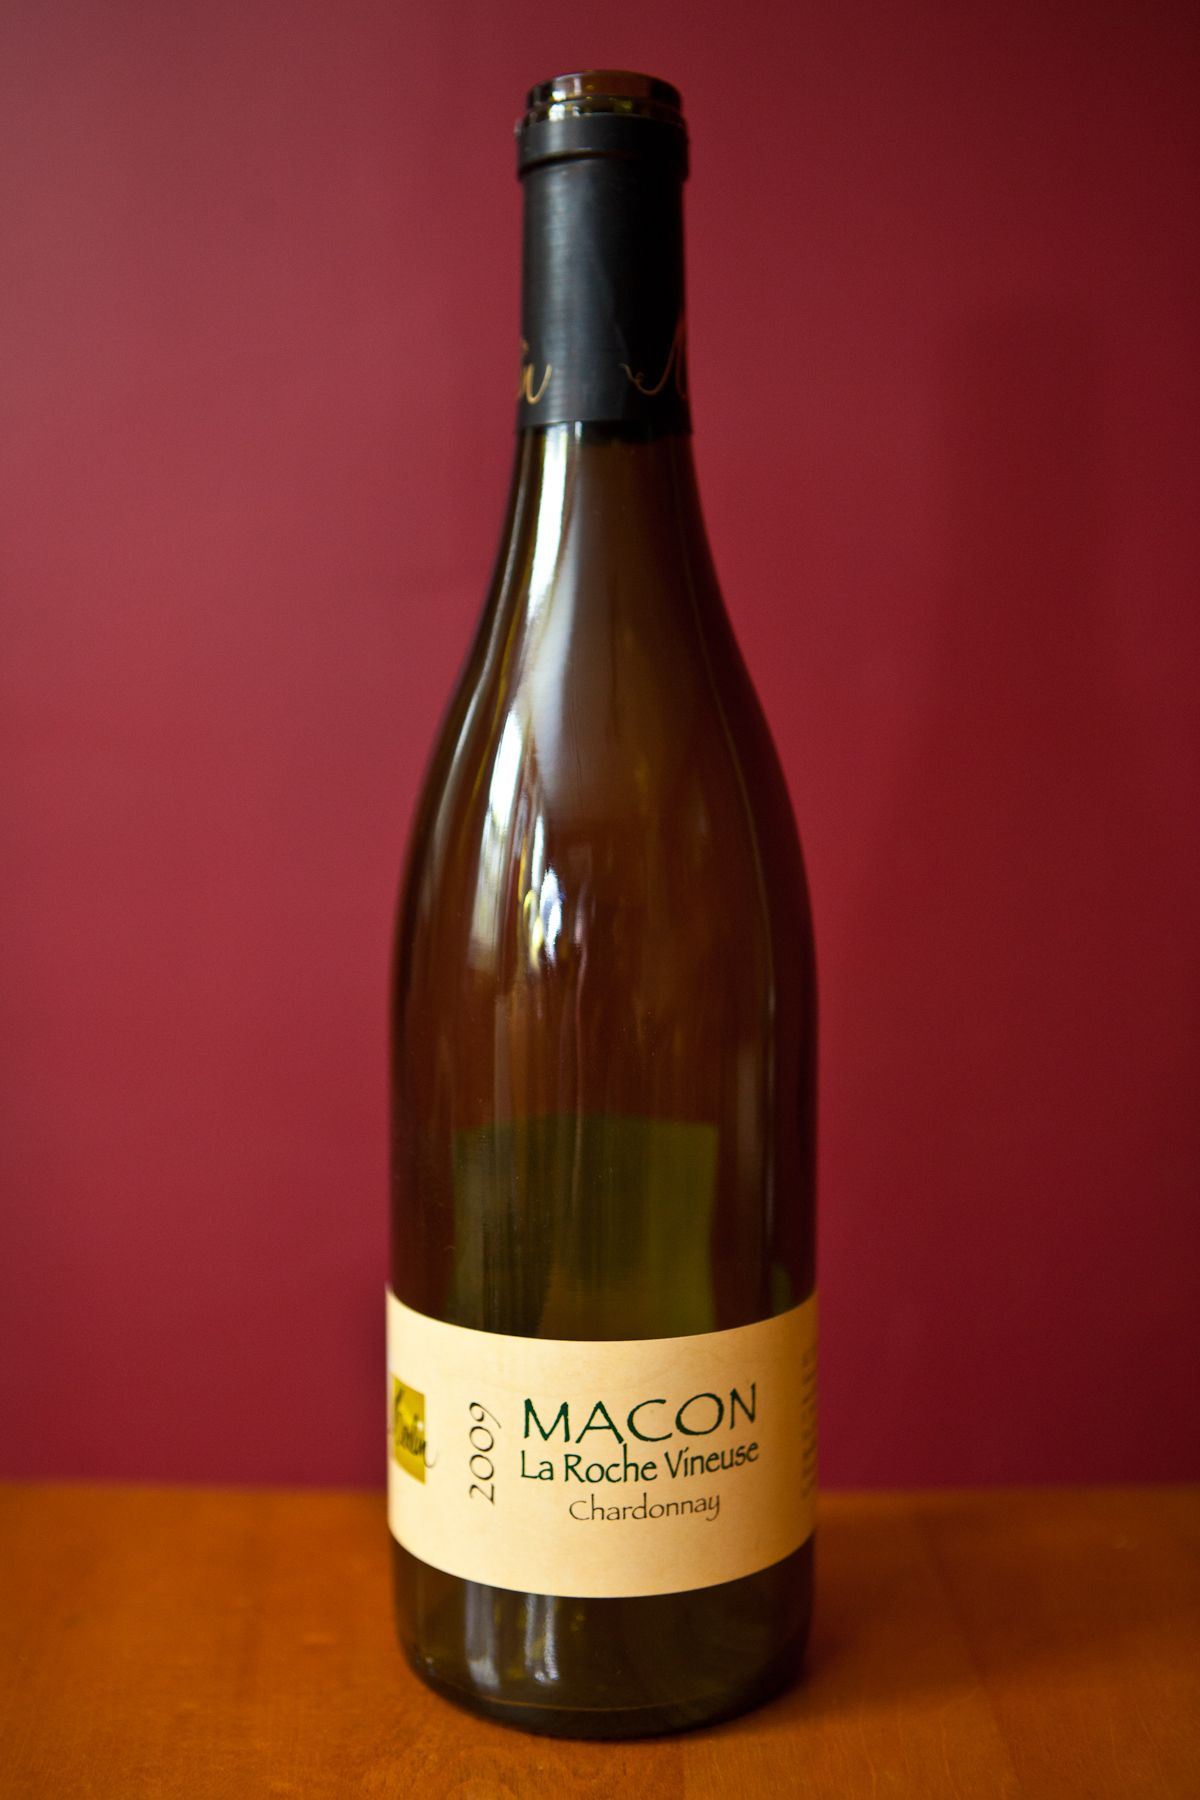 Macon La Roche Vineuse Chardonnay Organic Wine Chardonnay Wine Bottle